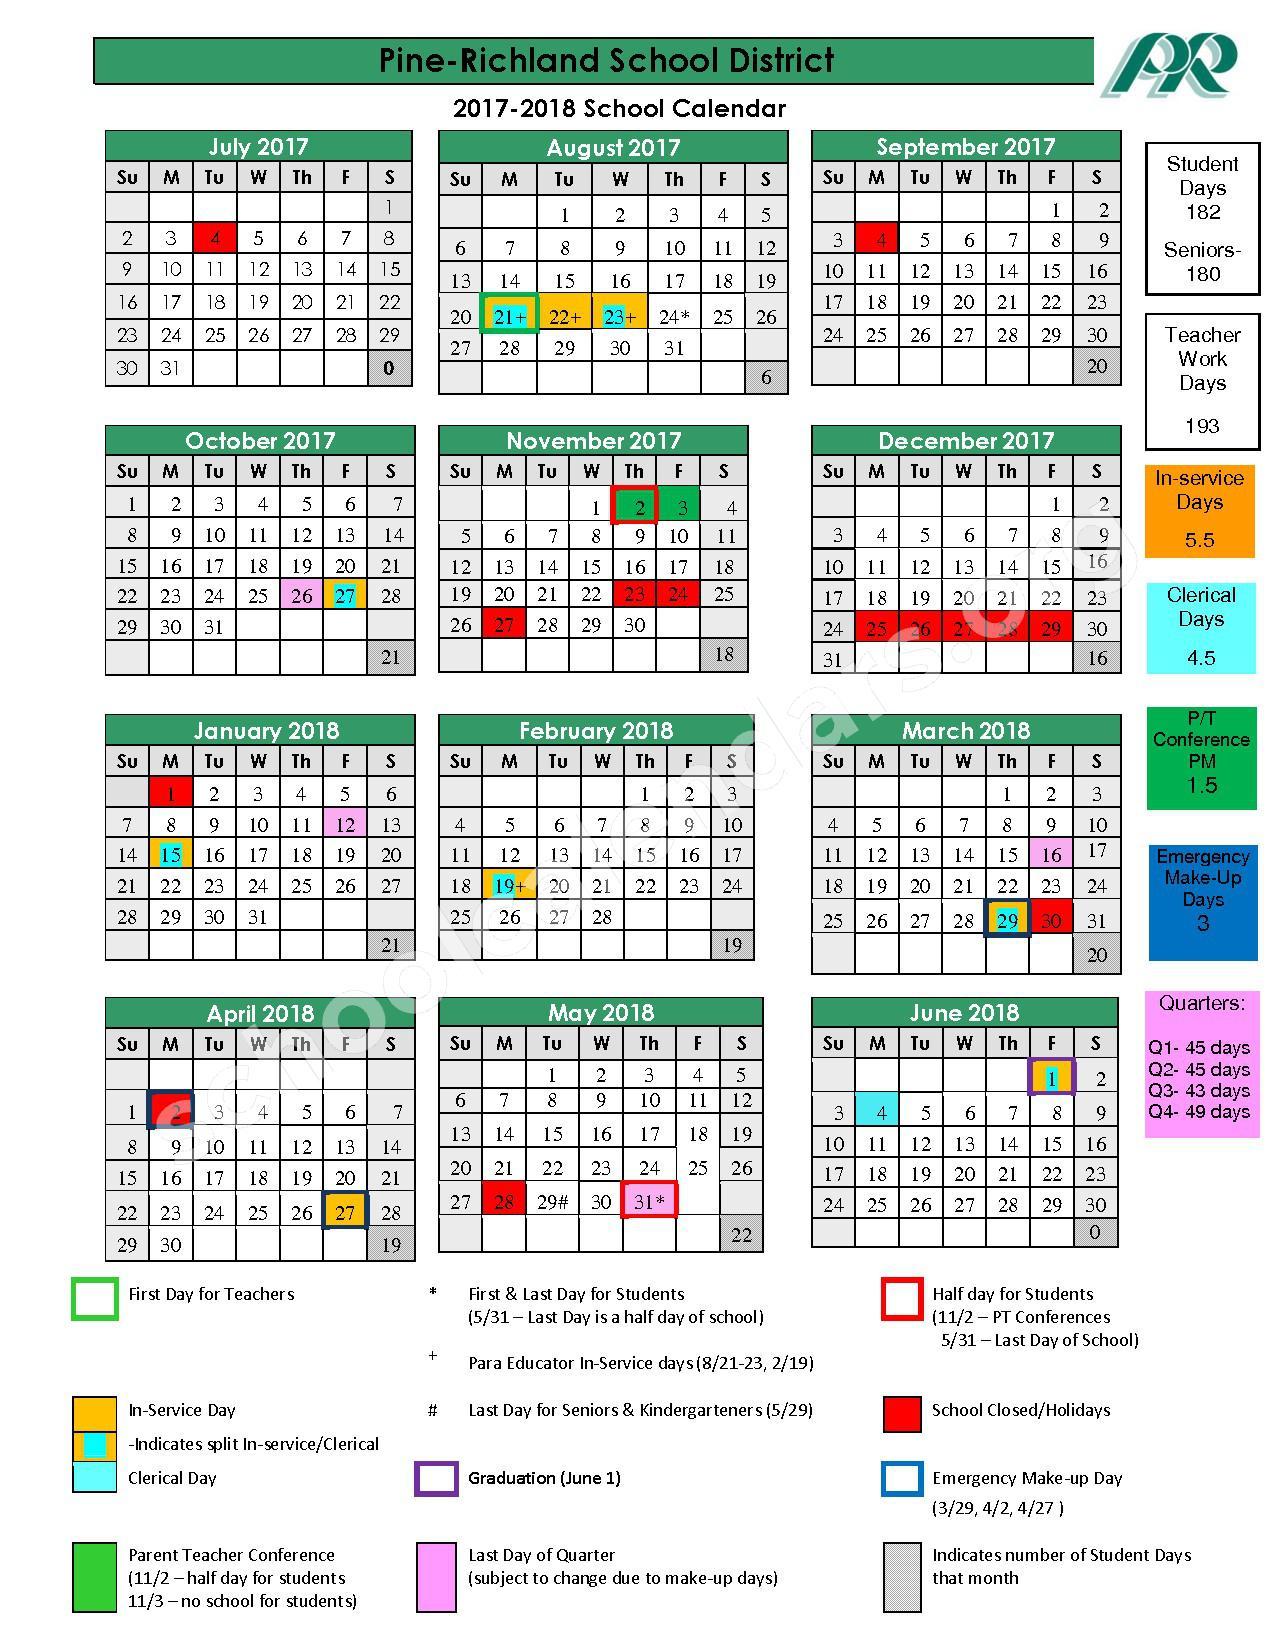 2017 - 2018 School Calendar – Pine-Richland School District – page 1